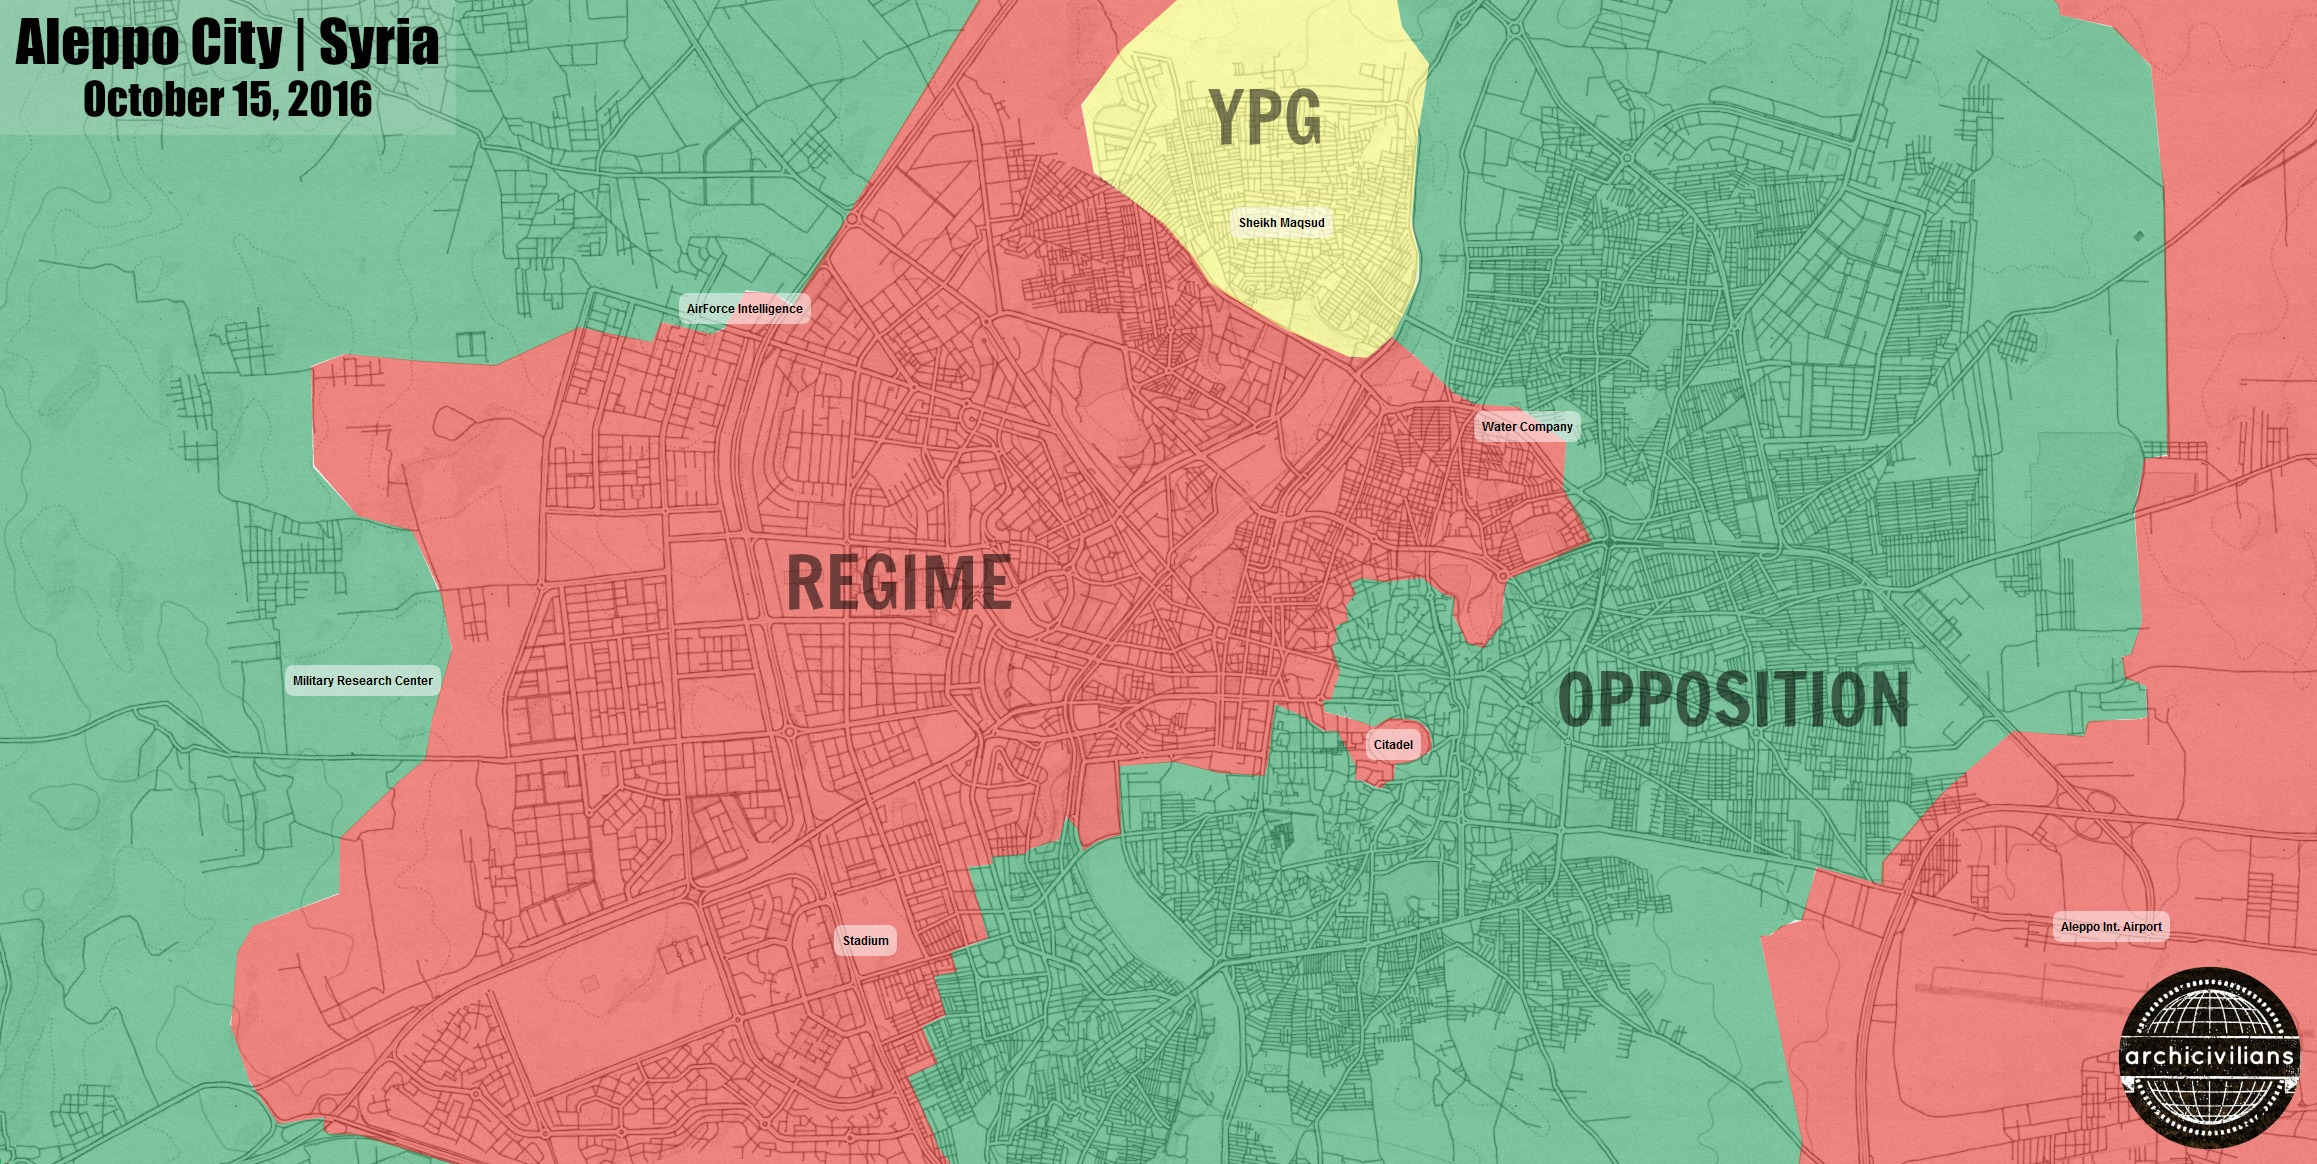 Битва за Алеппо, положение сил в городе: карта города